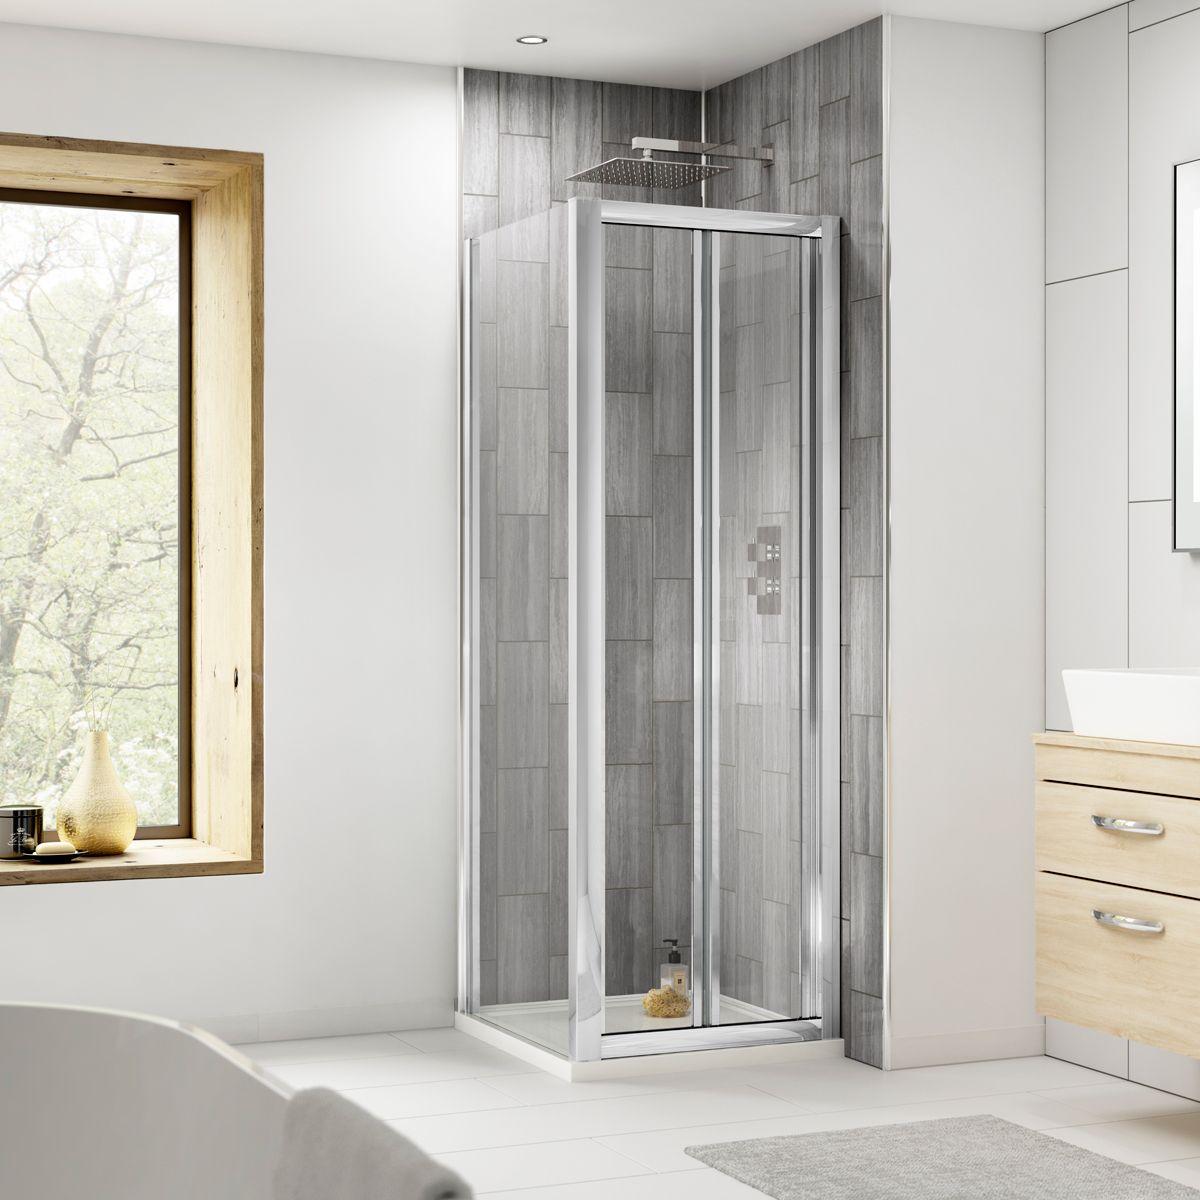 Nuie Pacific Bi-Fold Shower Door with Optional Side Panel